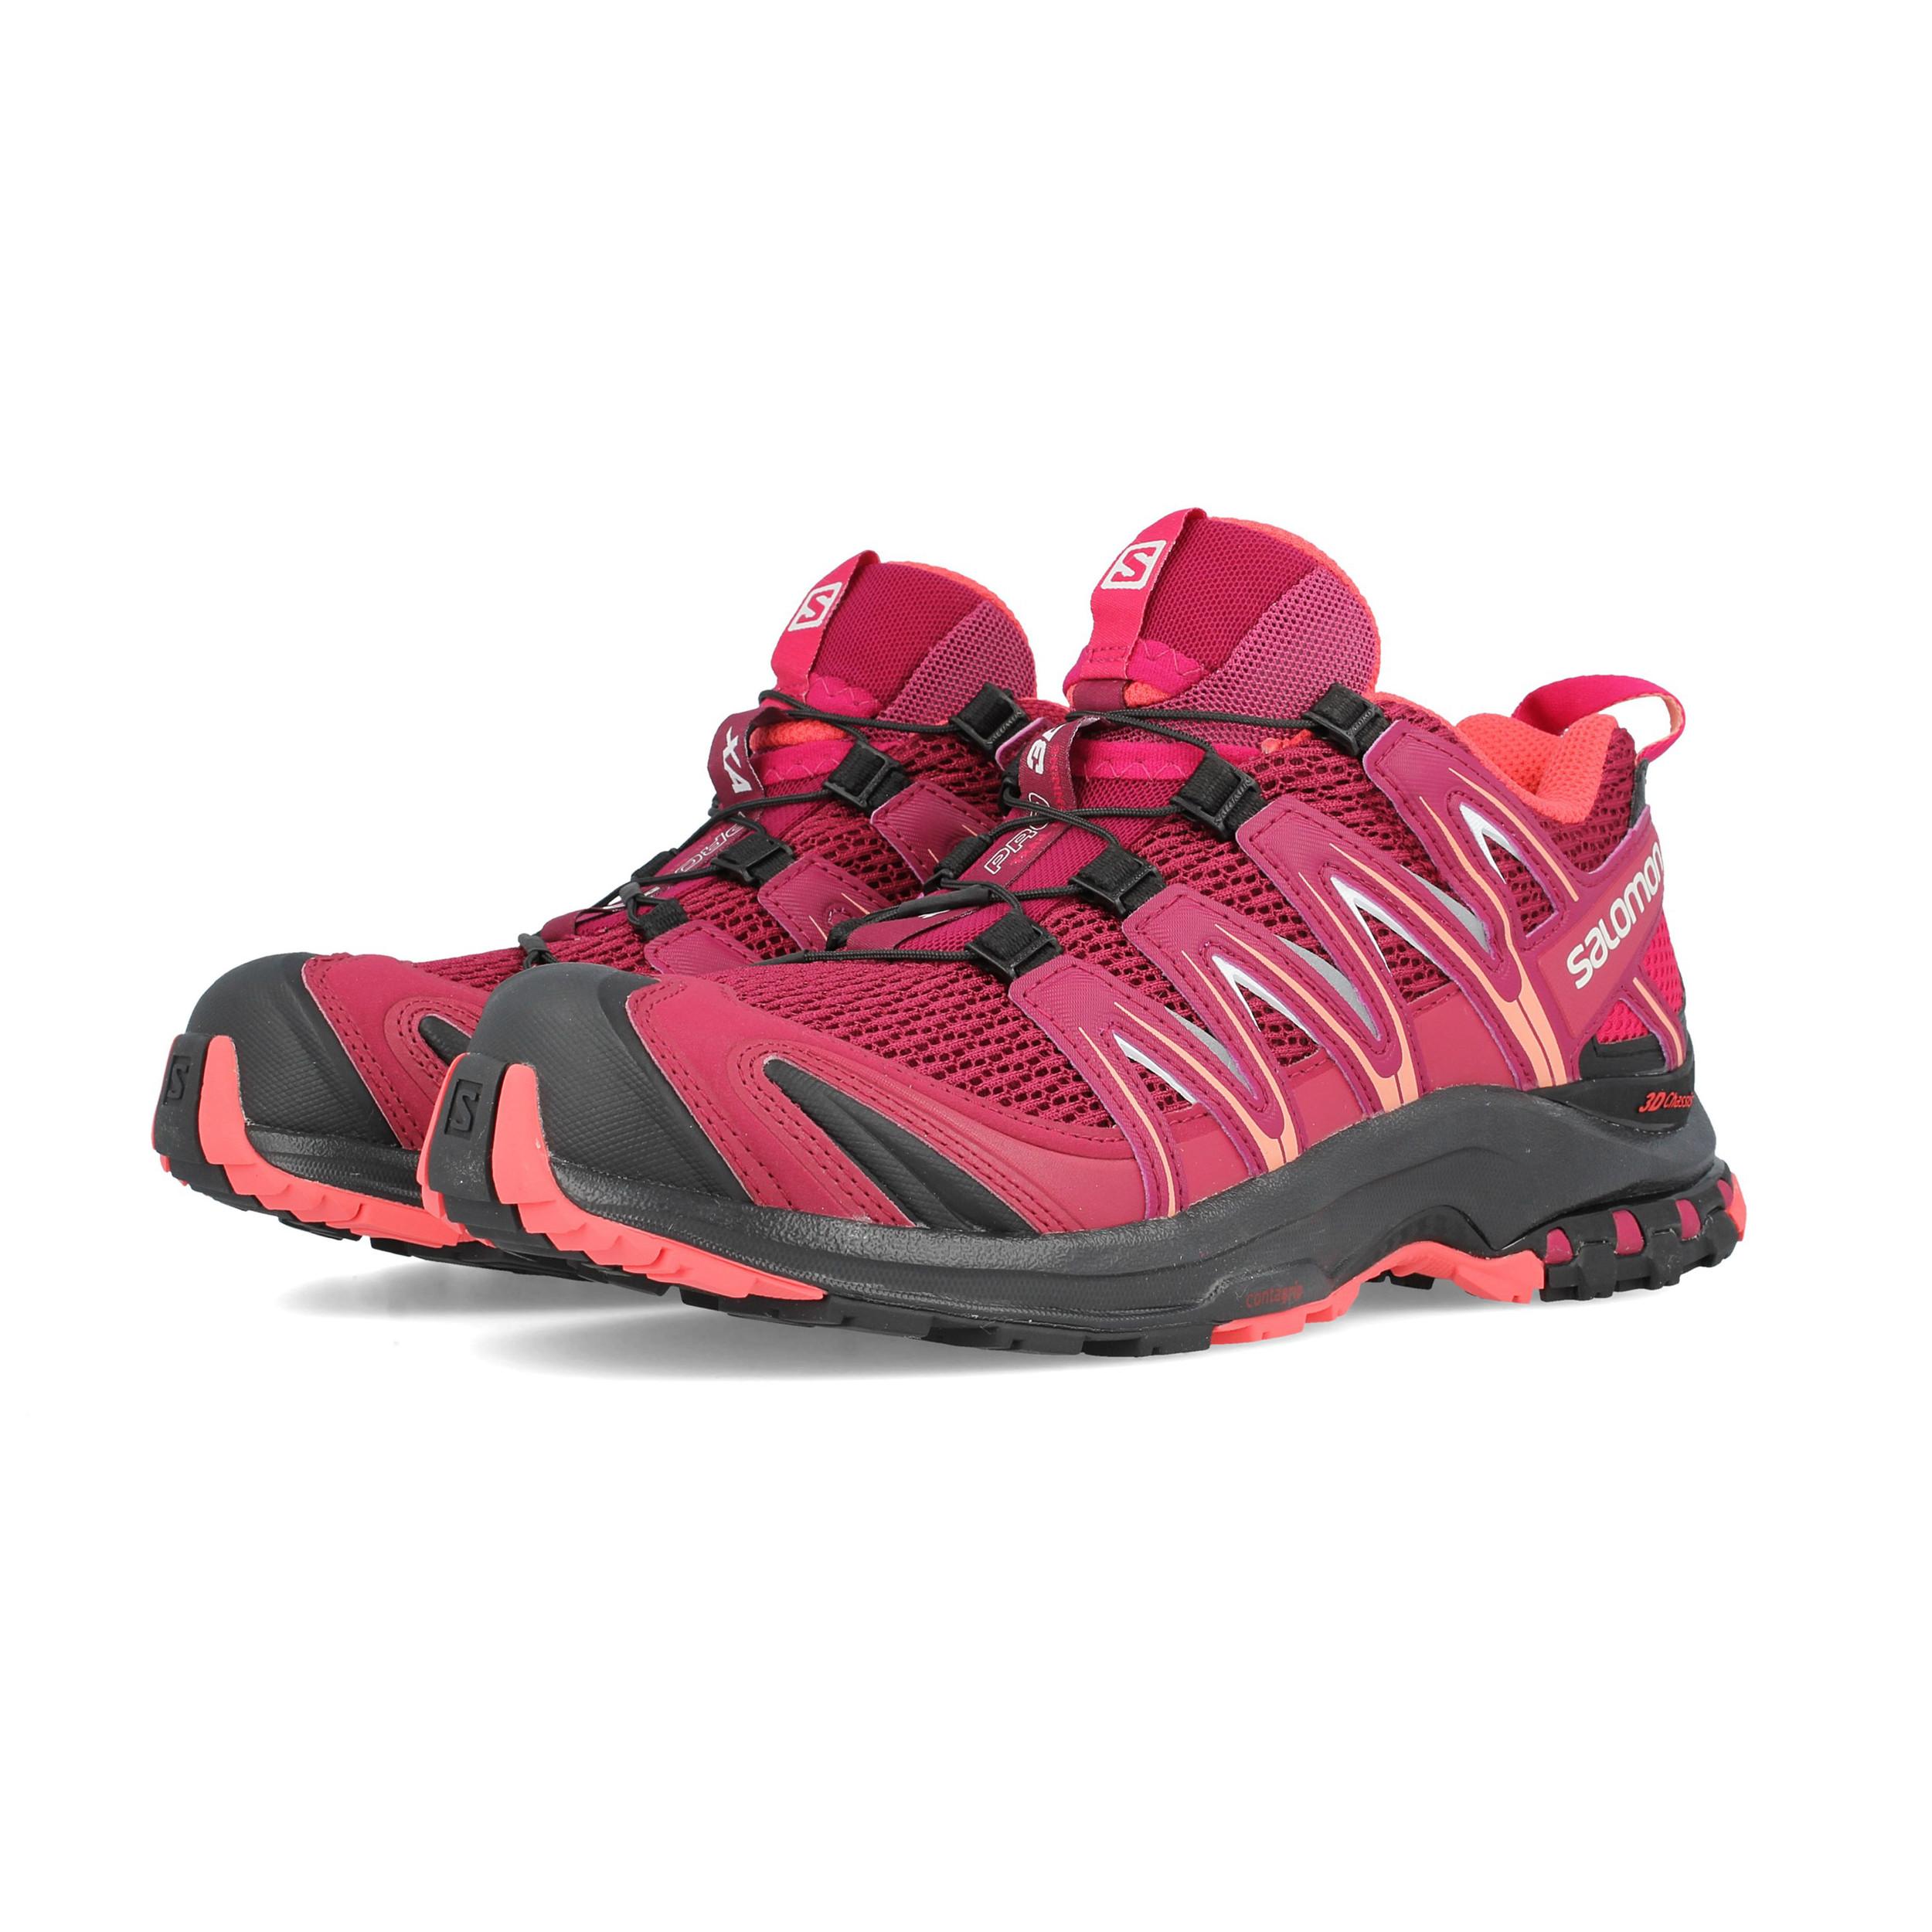 Correr De Zapatillas Rojo Running 3d Sendero Pro Zapatos Xa Detalles Deporte Salomon Mujer 35A4RqjL